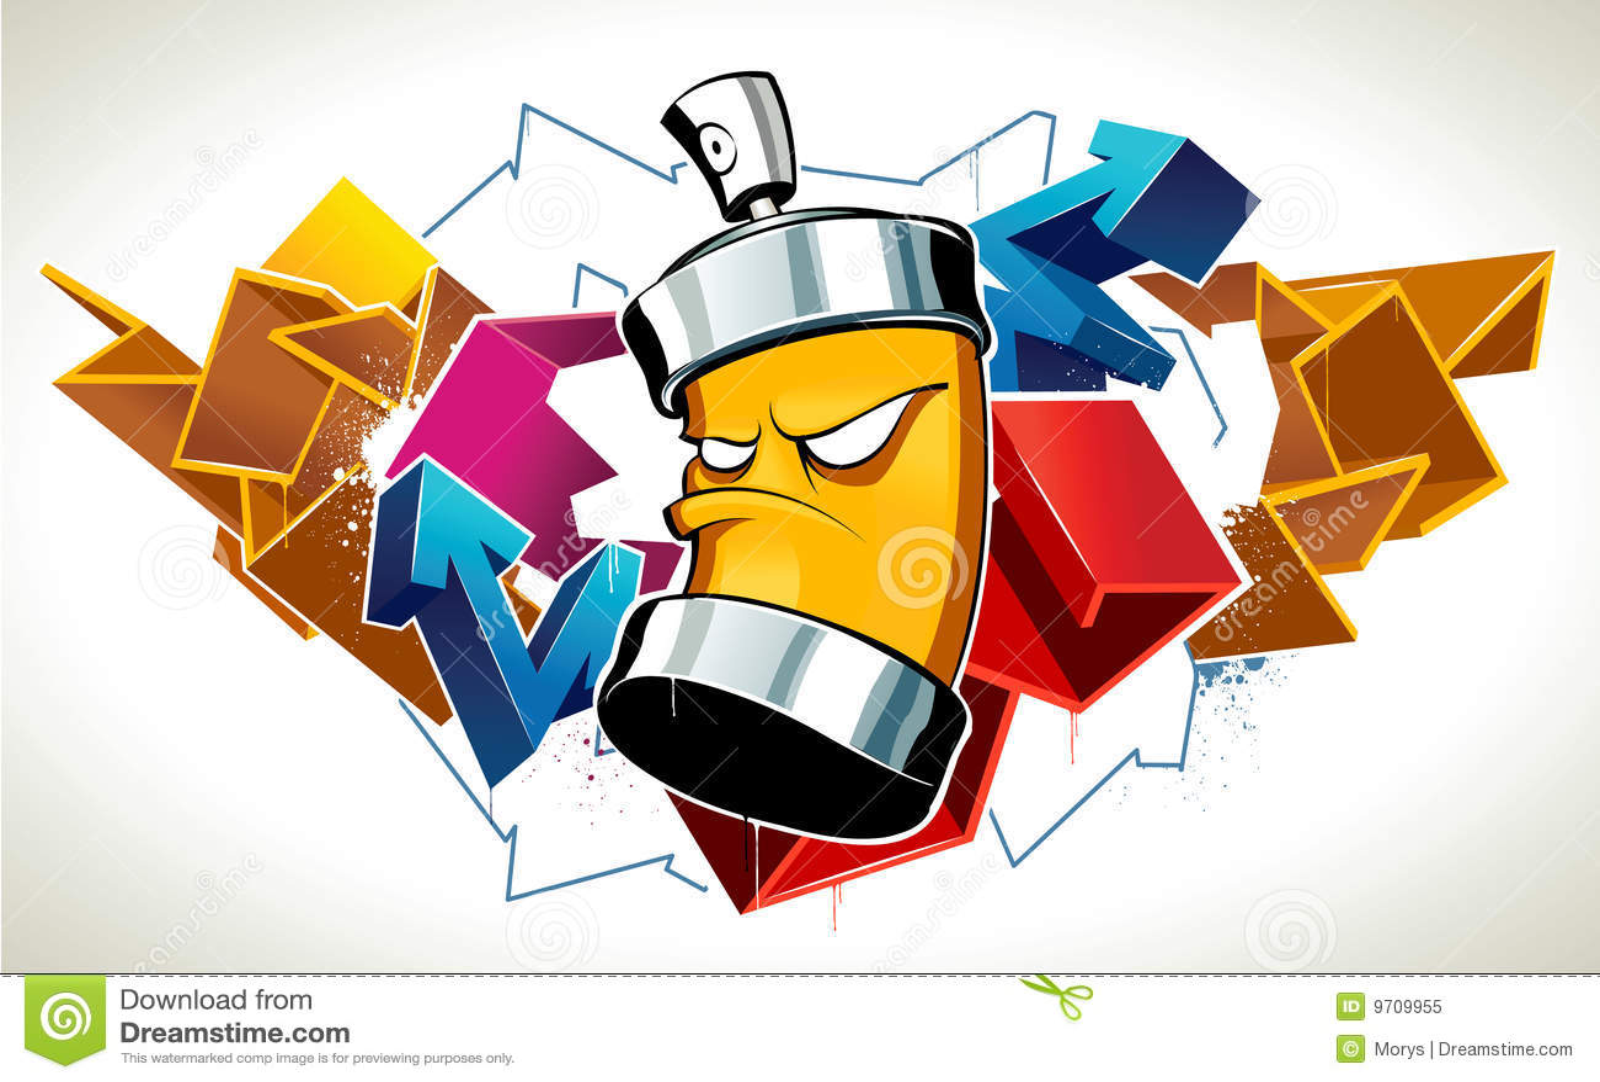 Cool Graffiti Royalty Free Stock Photo - Image: 9709955